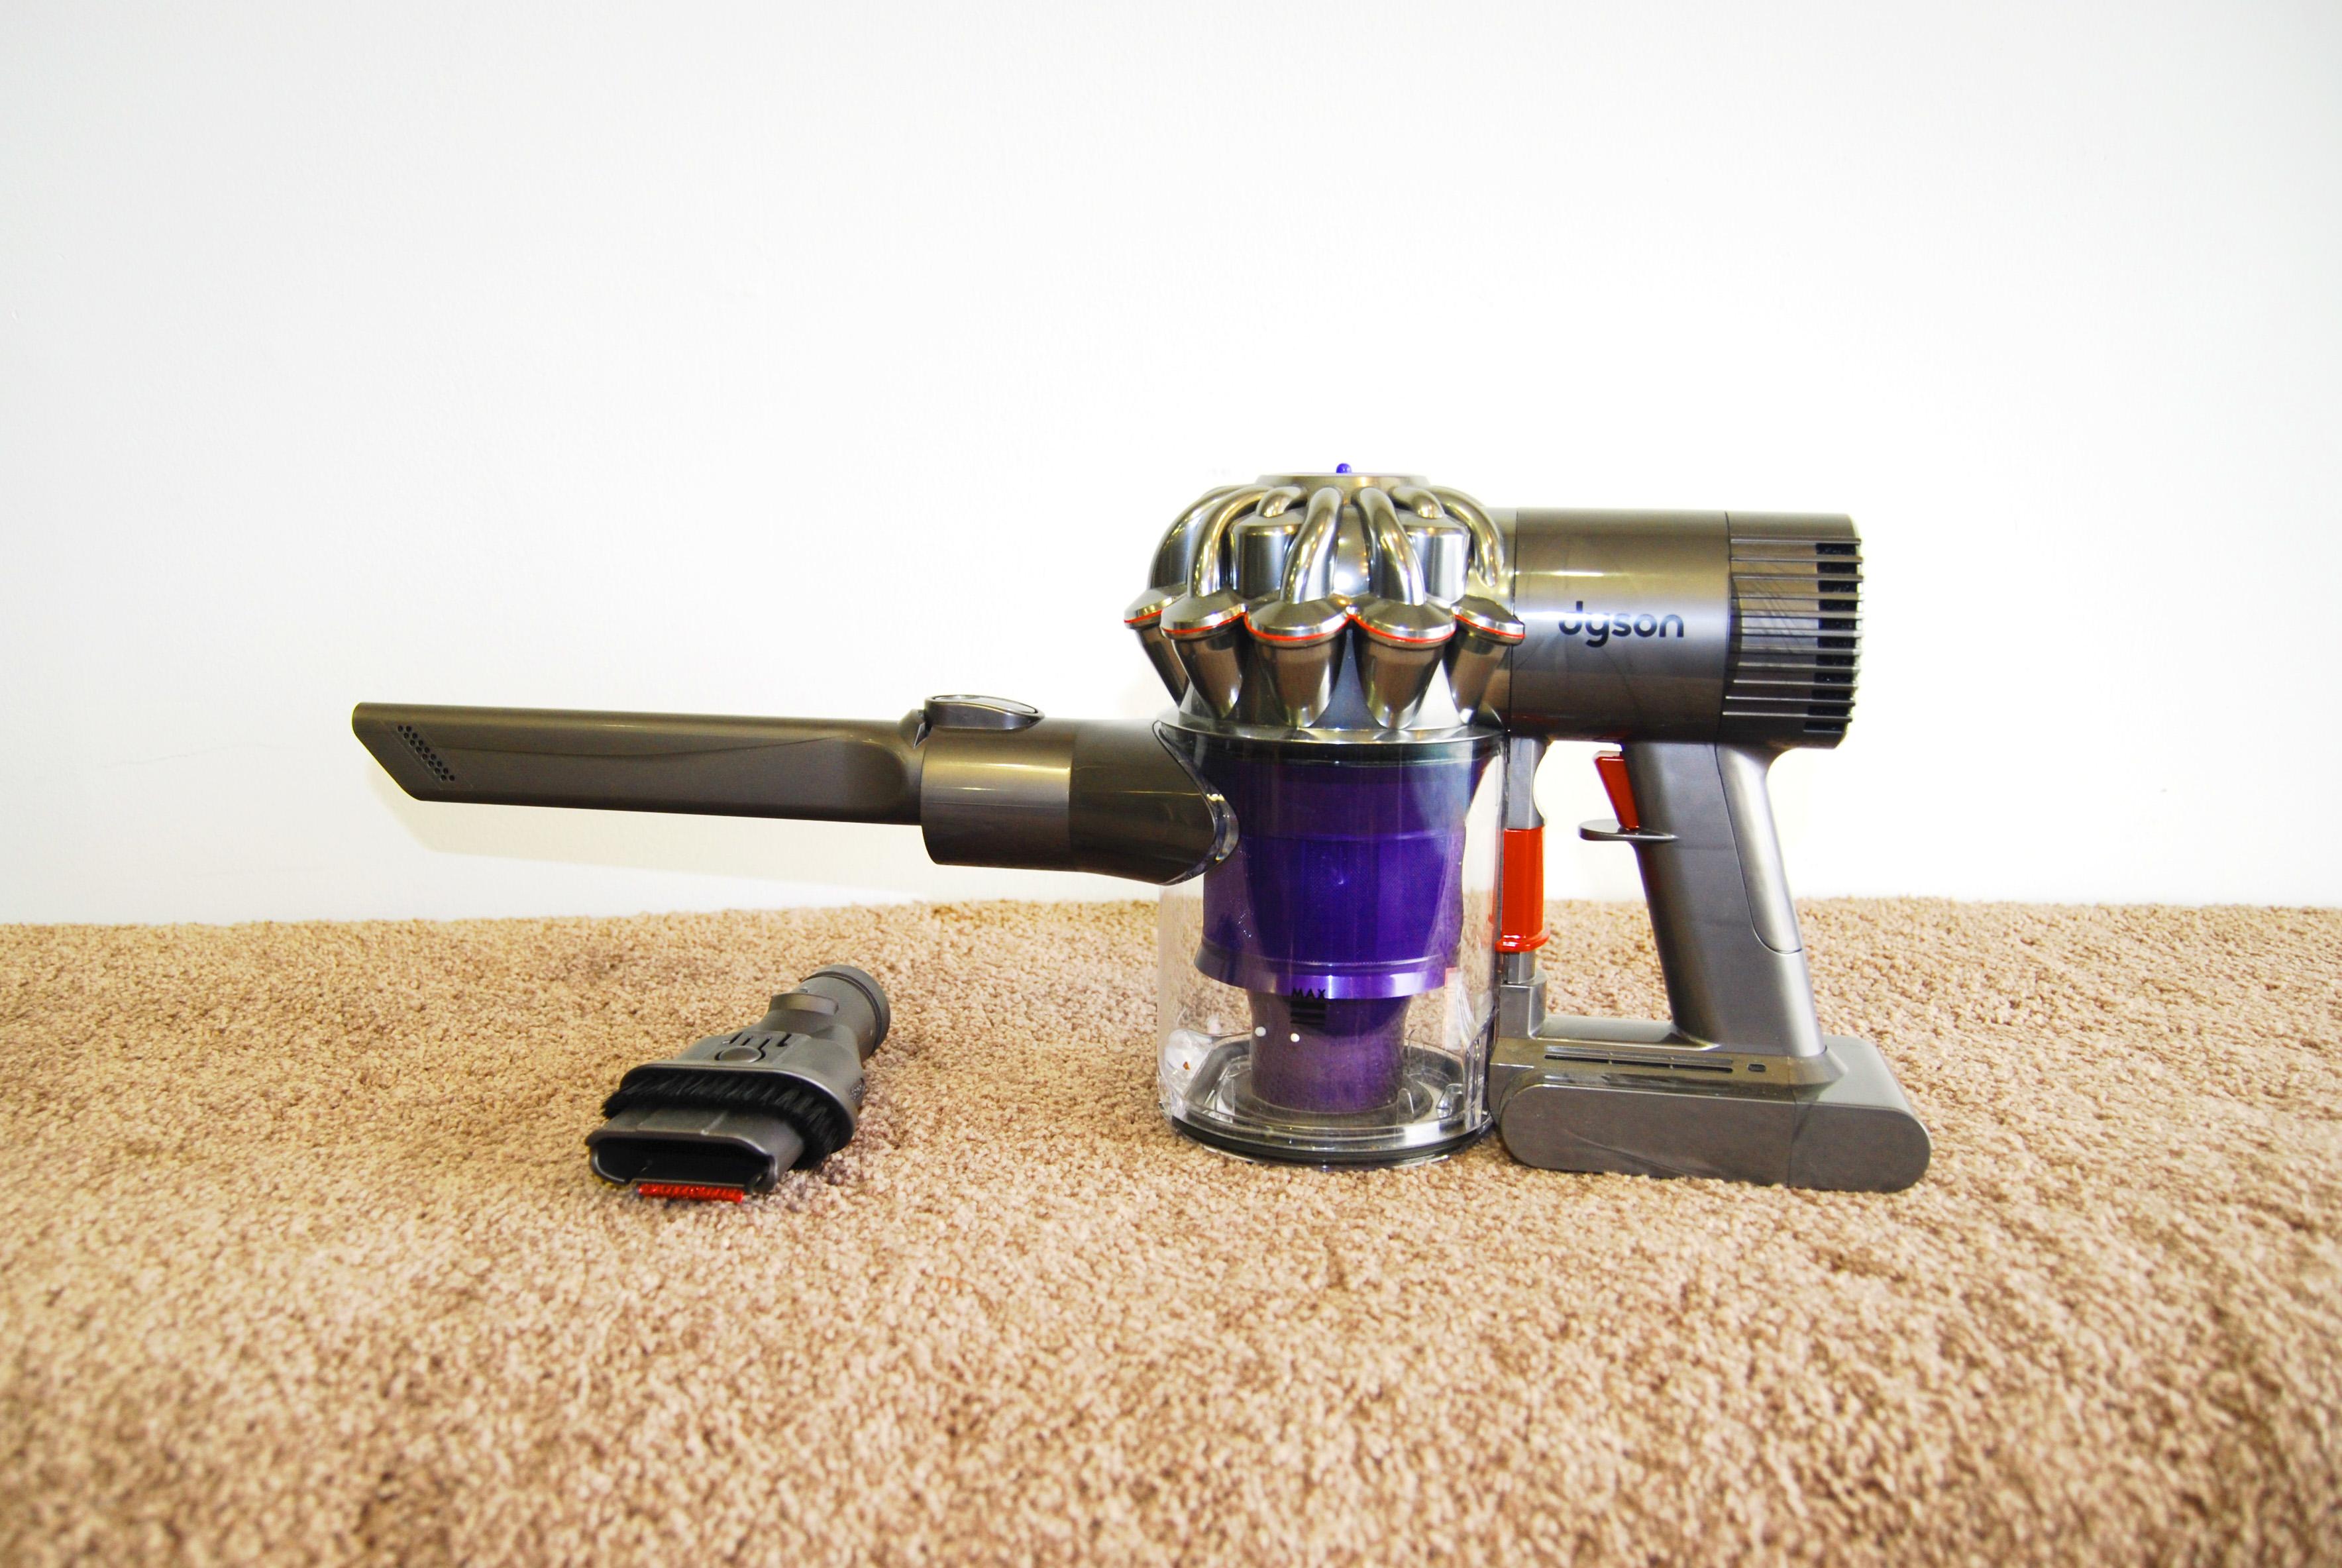 vacuum store products the vacuum store ann arbor michigan. Black Bedroom Furniture Sets. Home Design Ideas